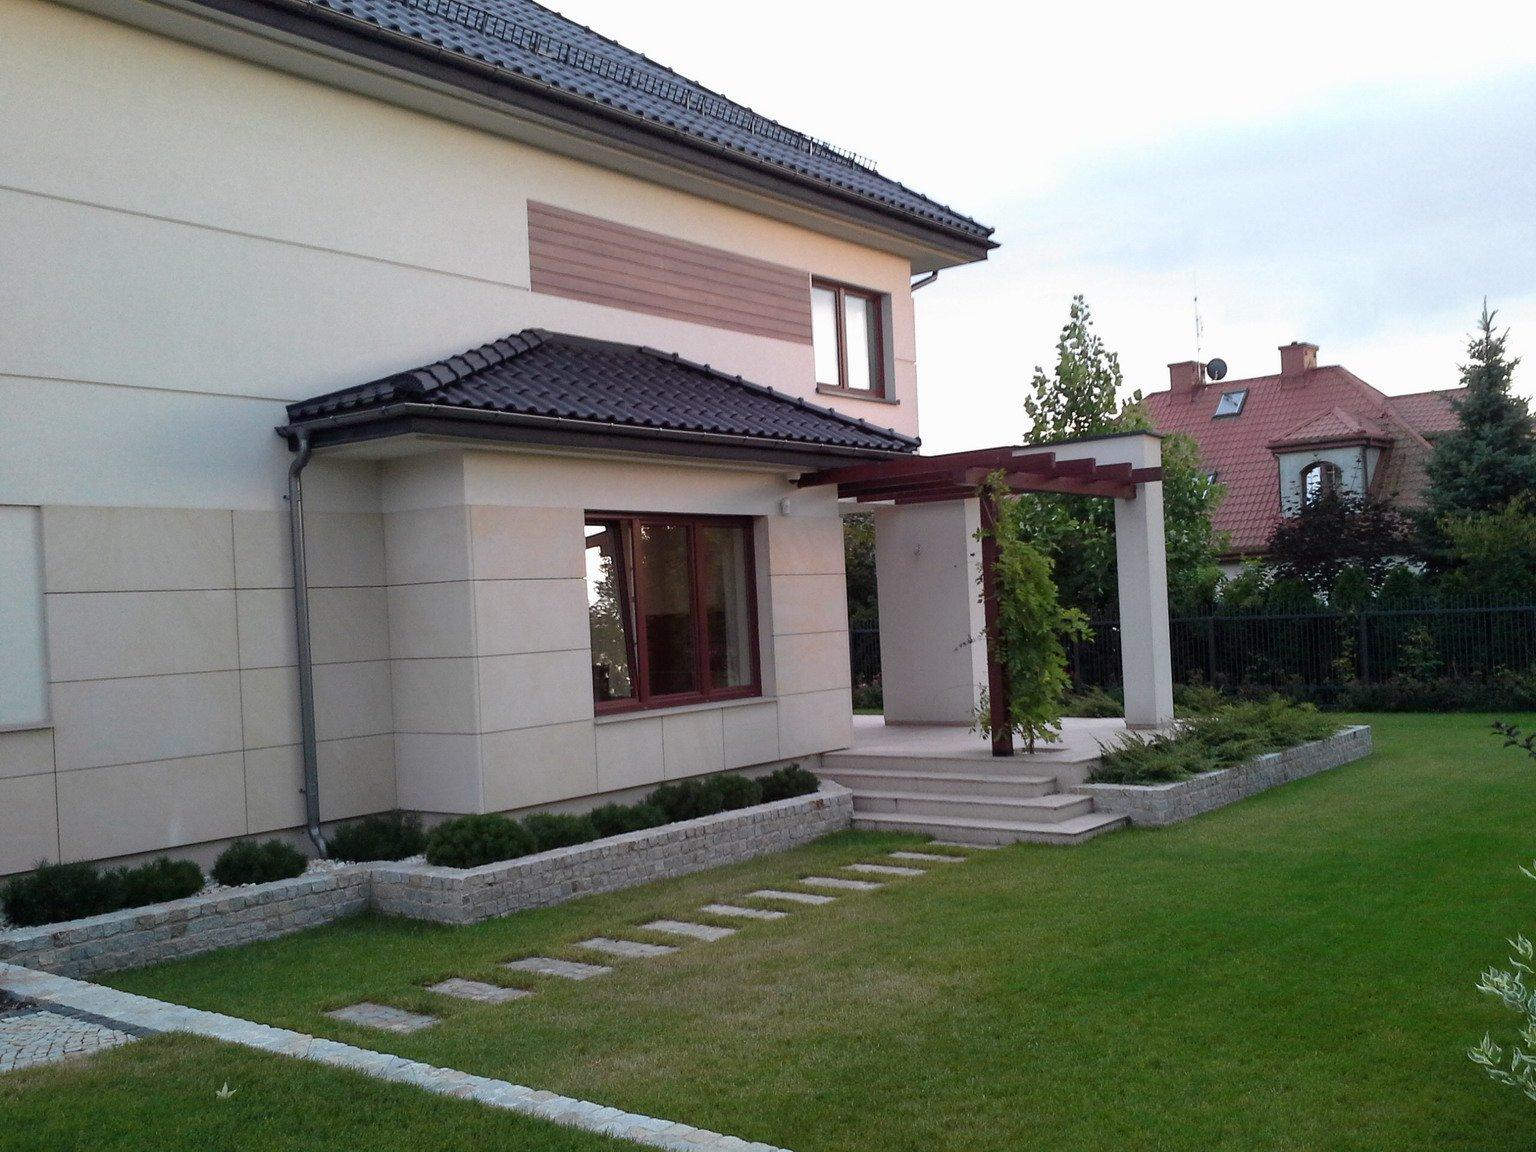 projekt-domu-slodki-fot-3-1382621964-zzxj0msl.jpg